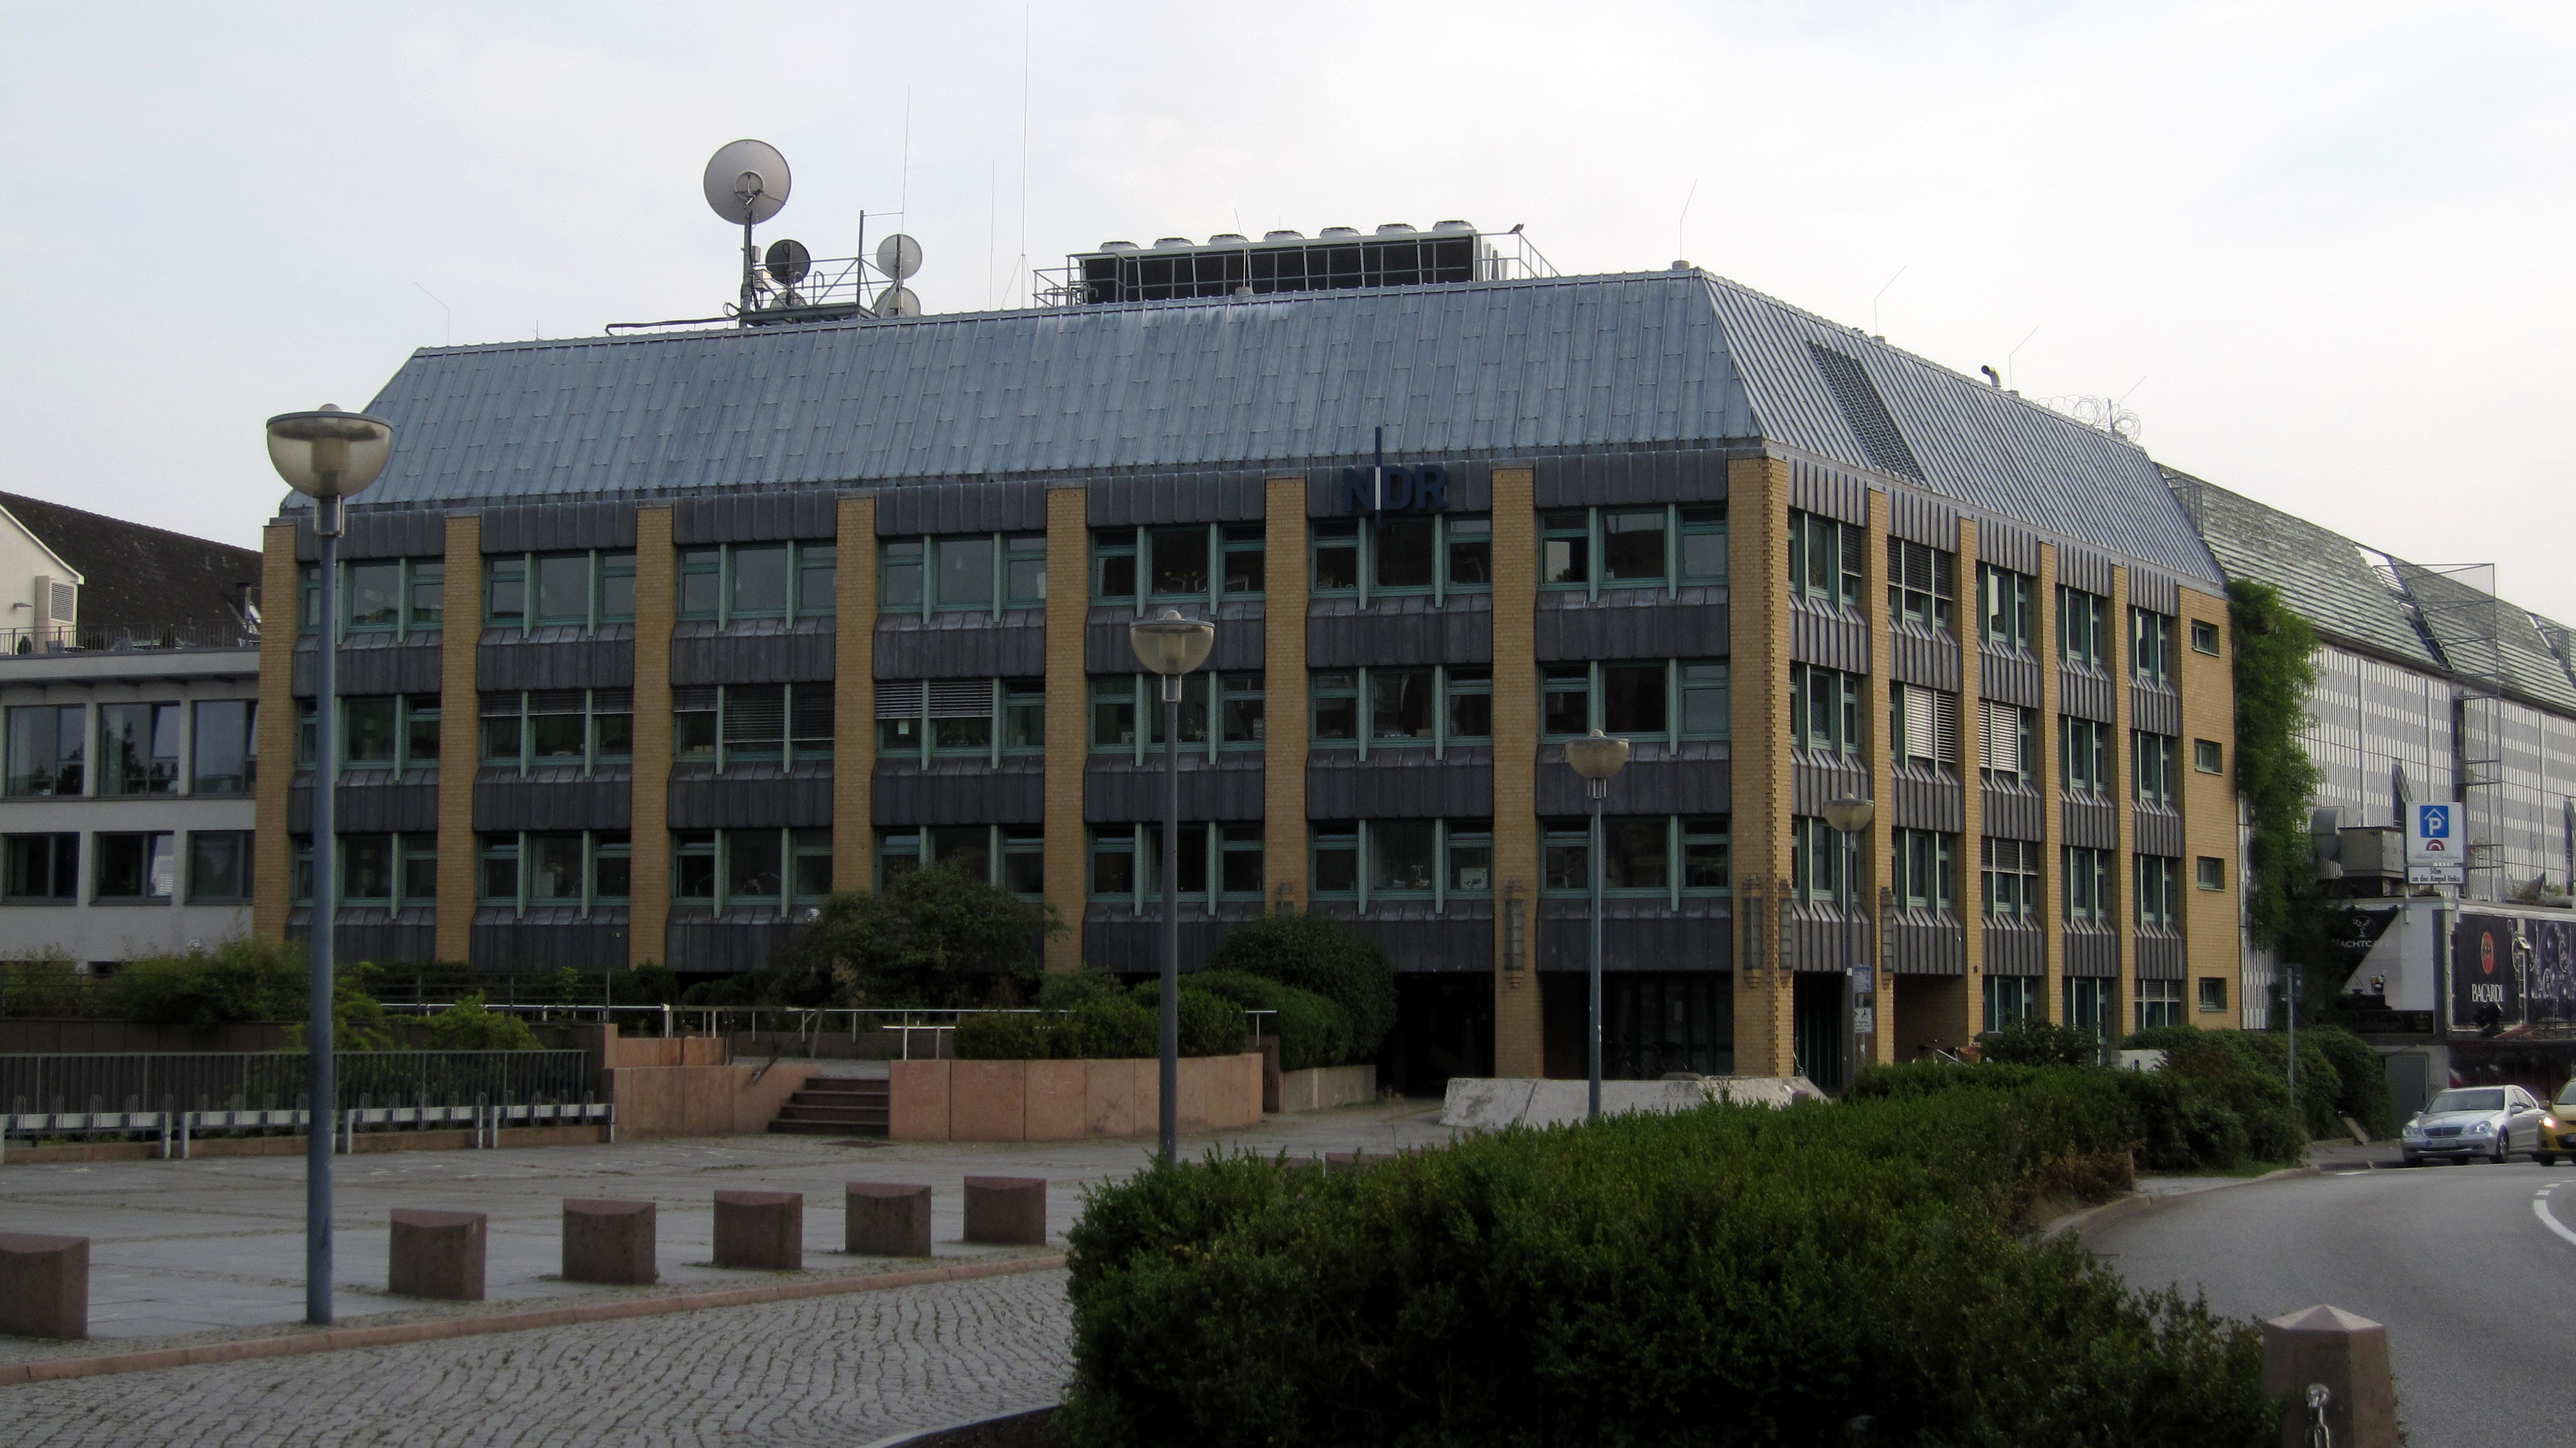 Ndr Landesfunkhaus Kiel